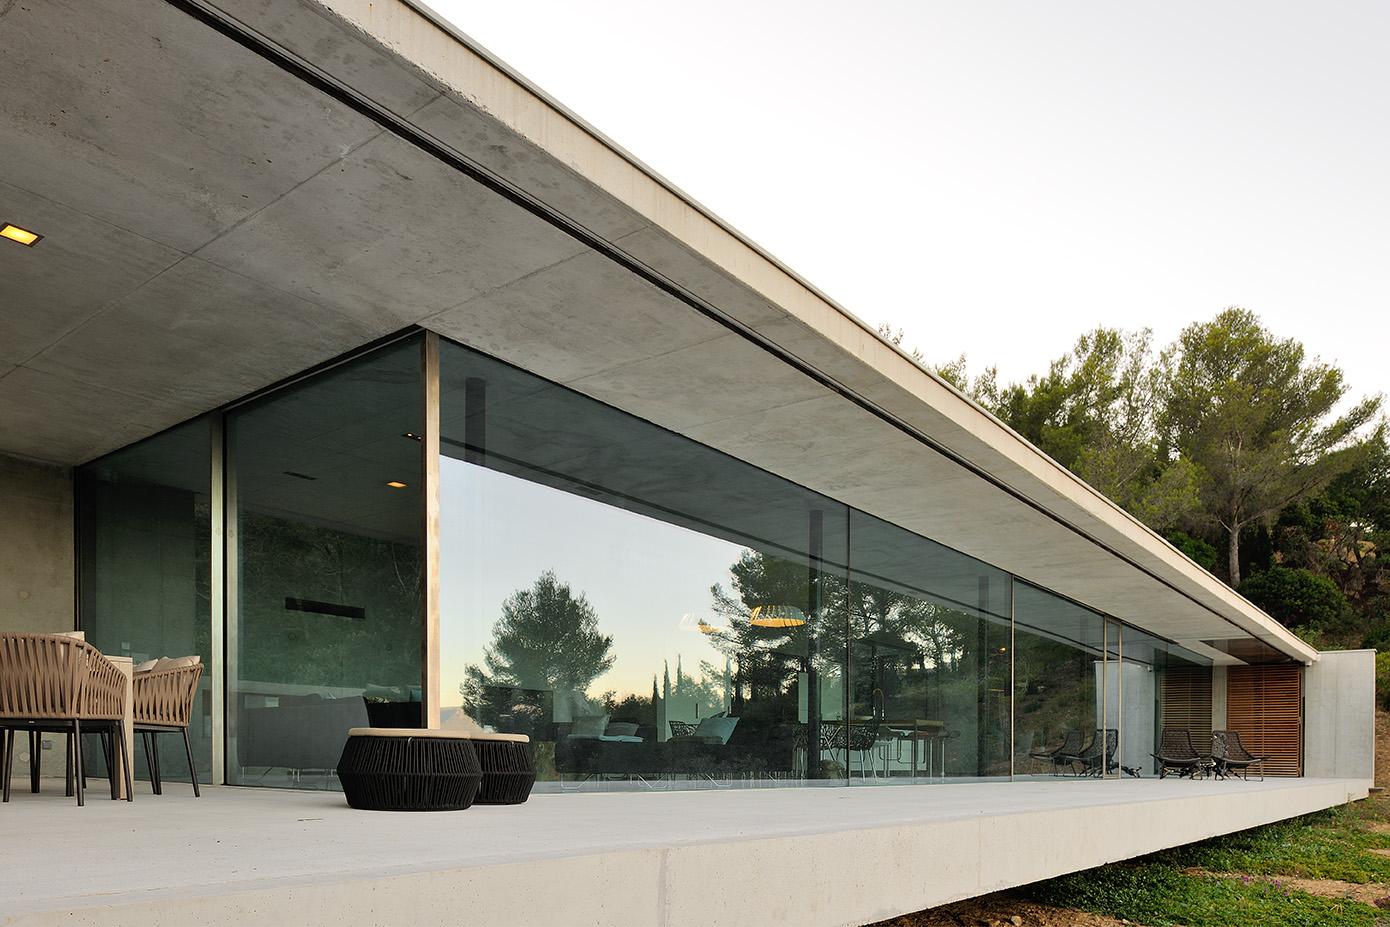 Maison mira ra 01 aum minassian architectes architecture for Architecture contemporaine